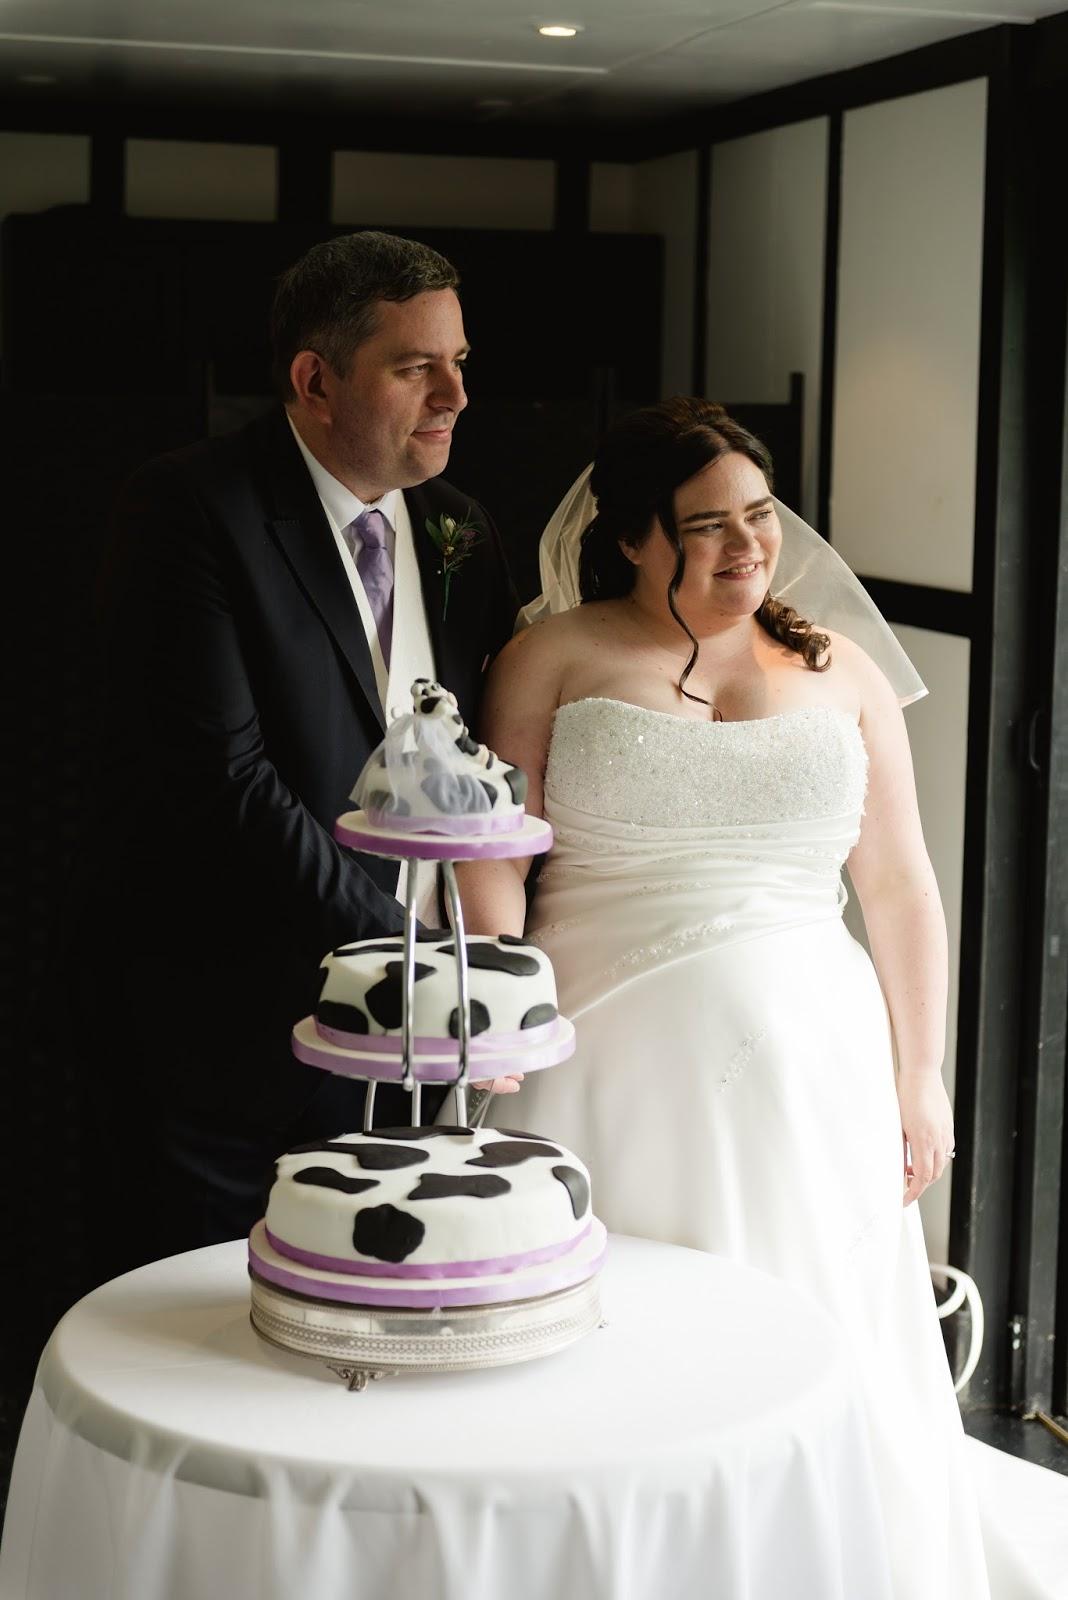 Make Your Own Wedding Cakes.Caroline Makes Making My Own Wedding Cake